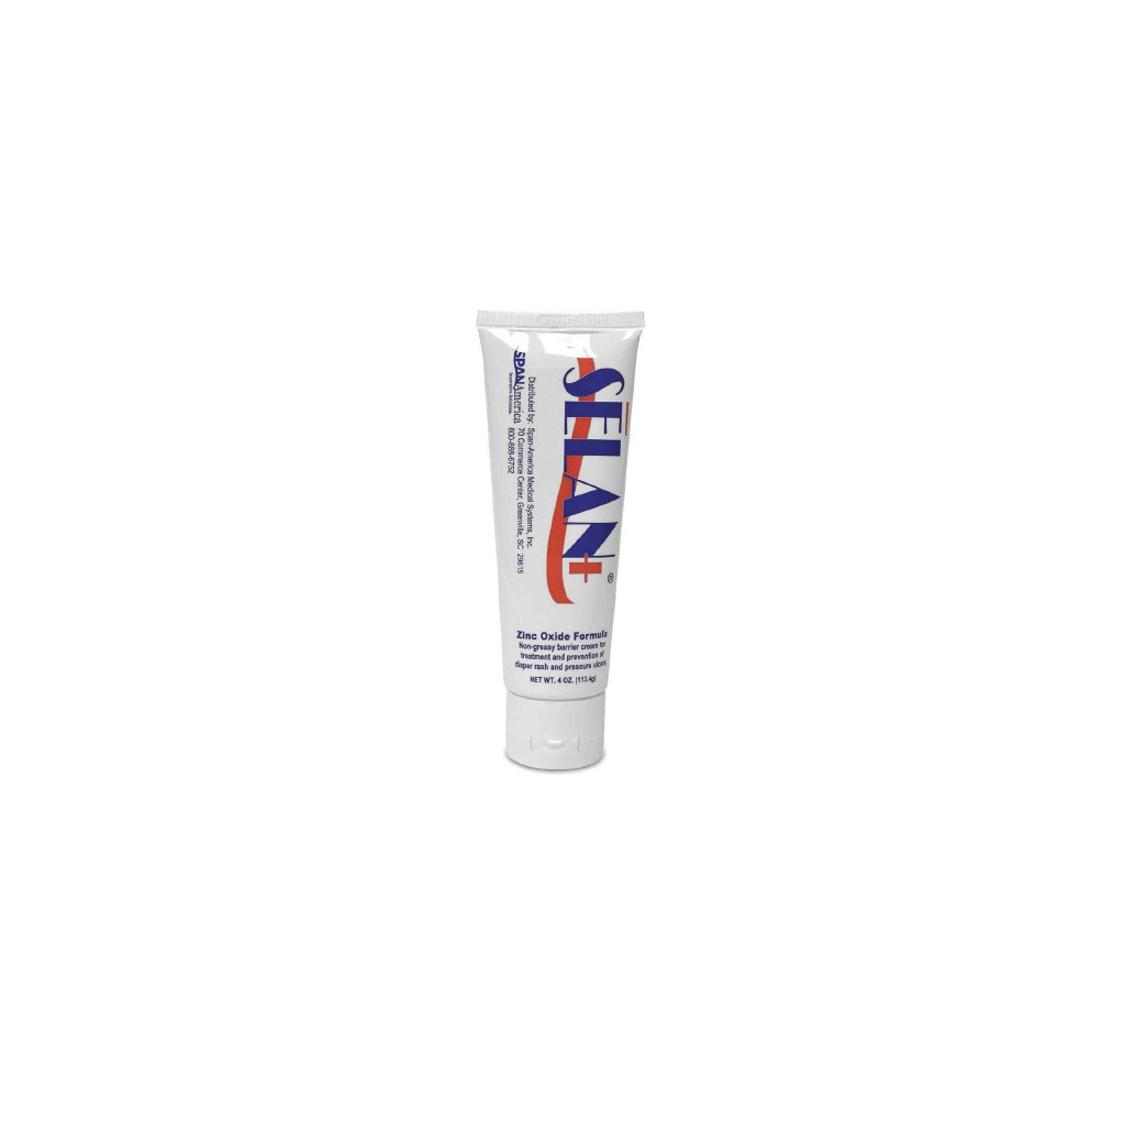 Skin Protectant Selan+® 4 oz. Tube Scented Cream